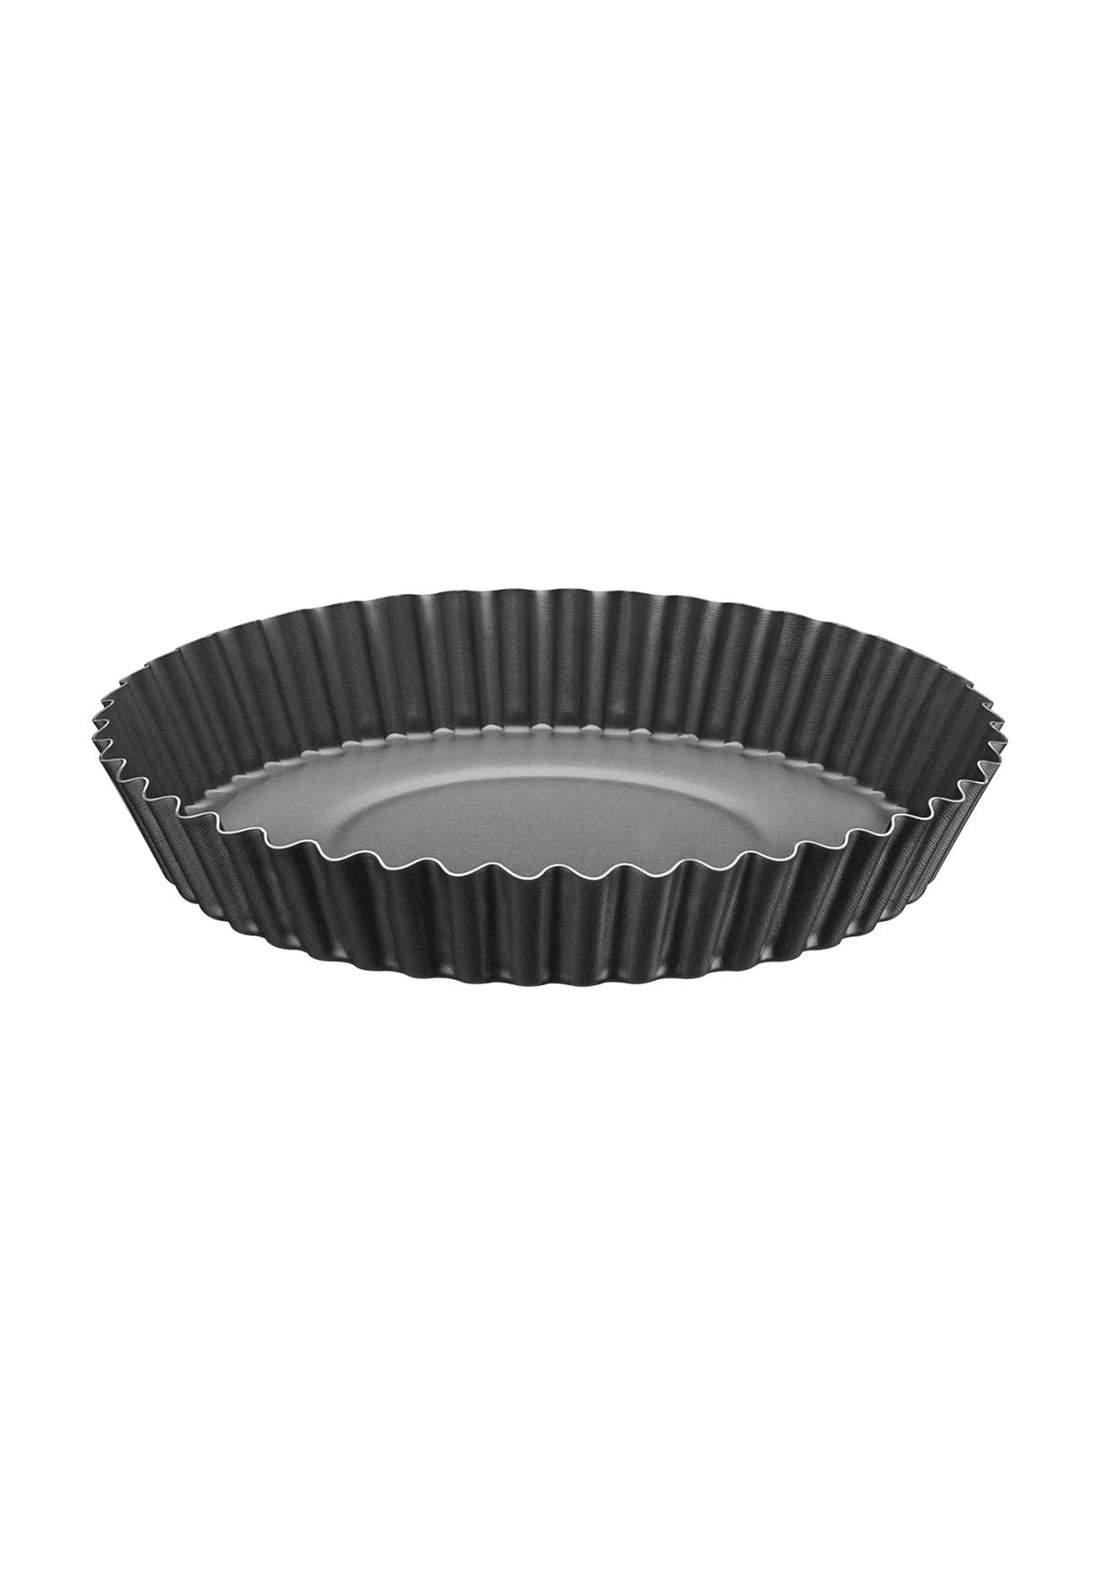 Tramontina '20056-026 Cake Mold  26 cm Black قالب كيك مقرنص